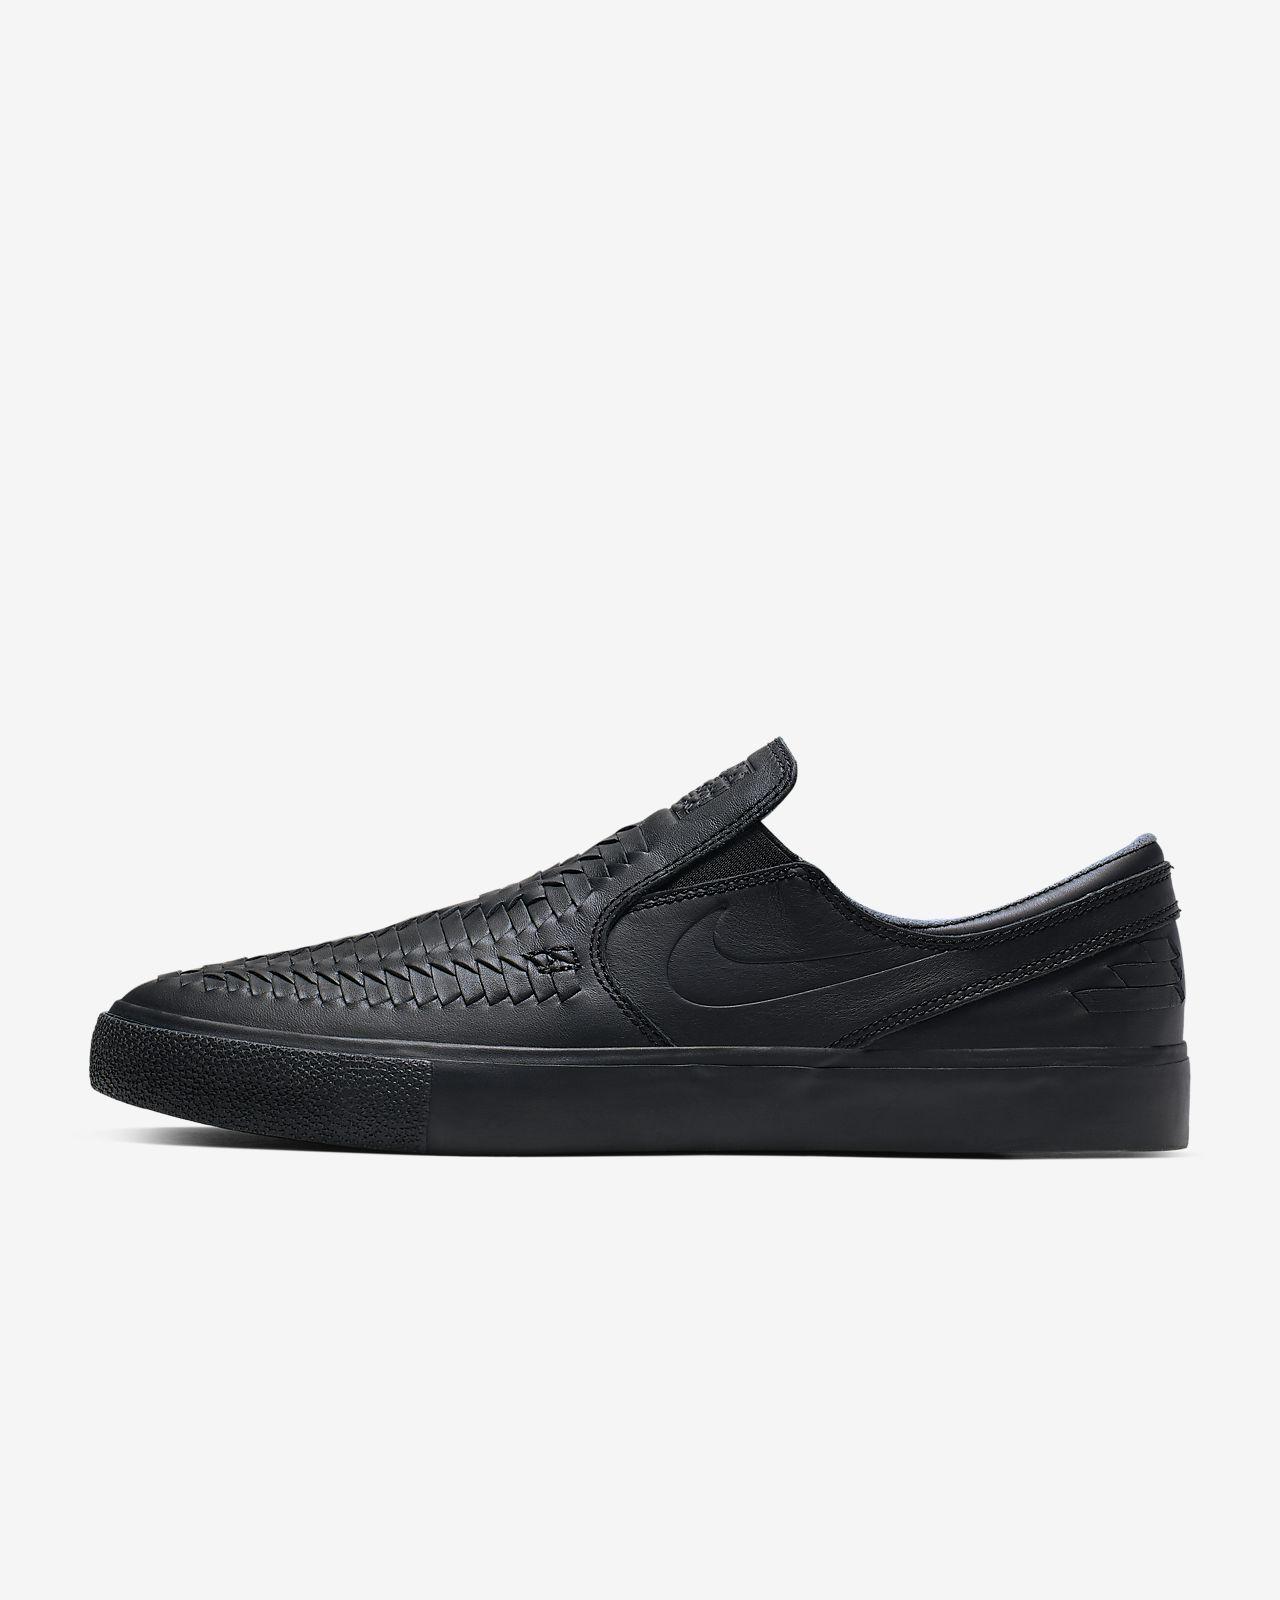 Nike SB Zoom Stefan Janoski Slip RM Crafted skatesko